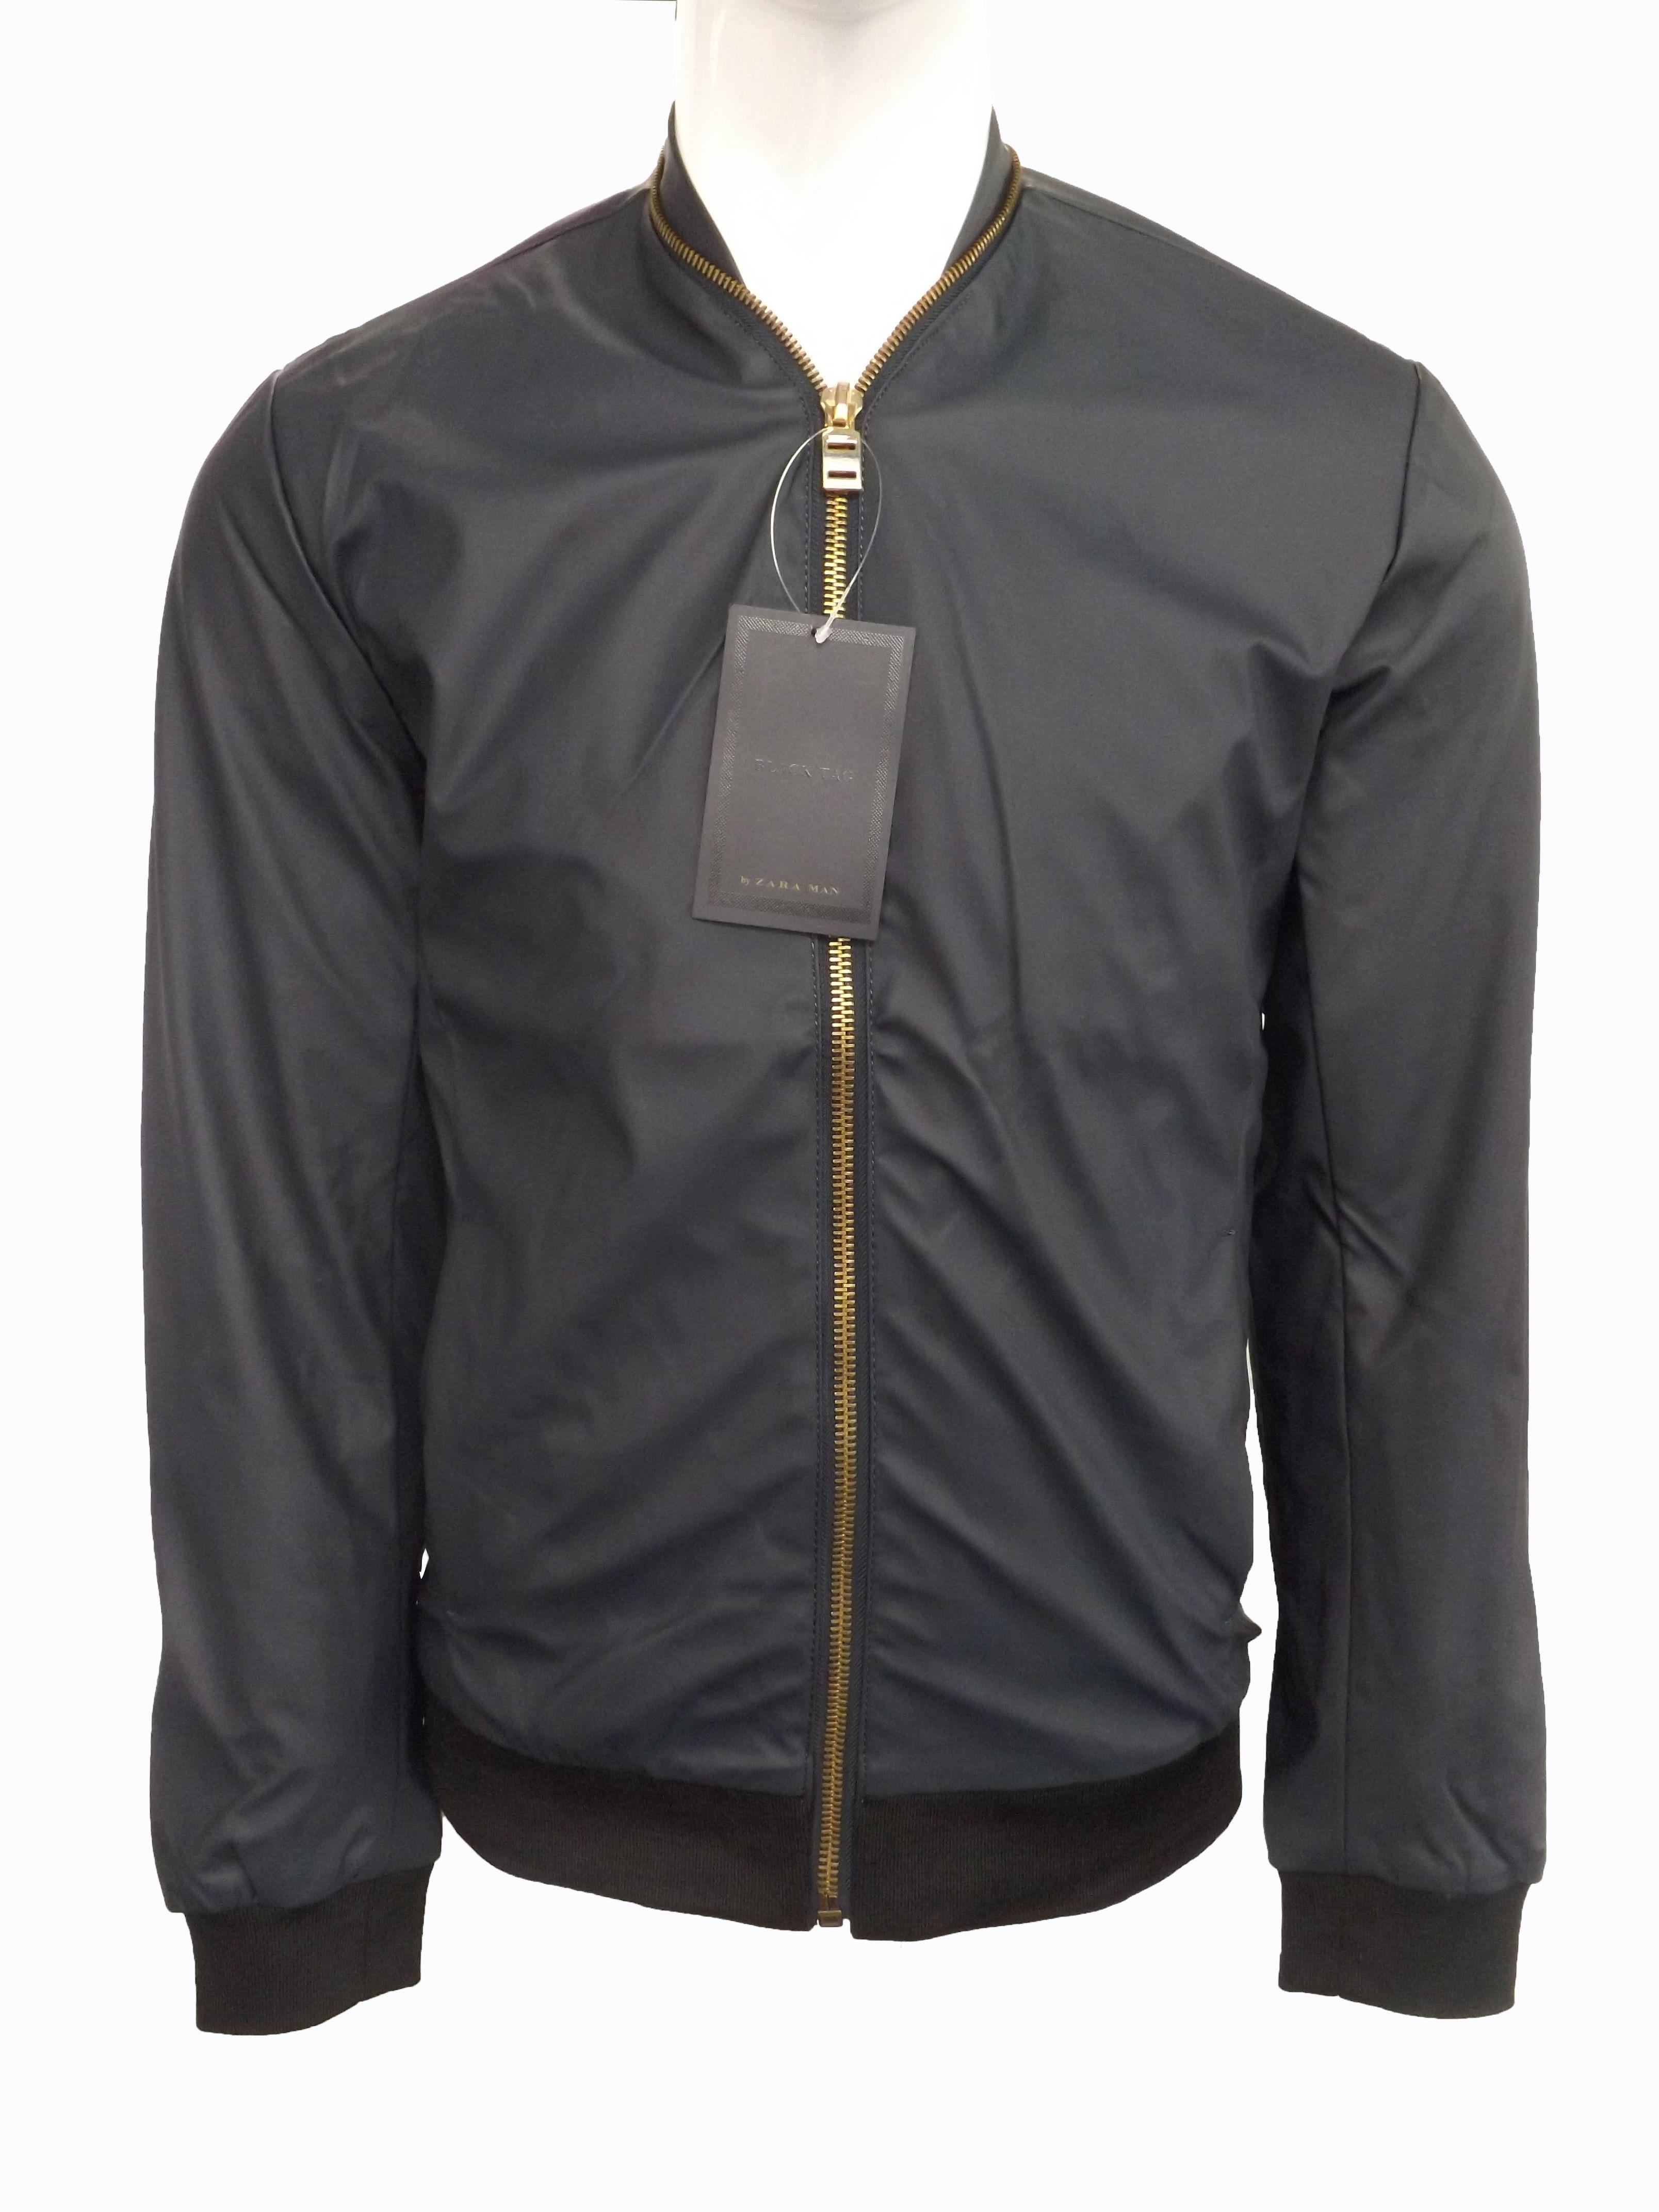 28b0612f Zara Mens Bomber Jacket. You can purchase it on www.crimsonandwhites ...